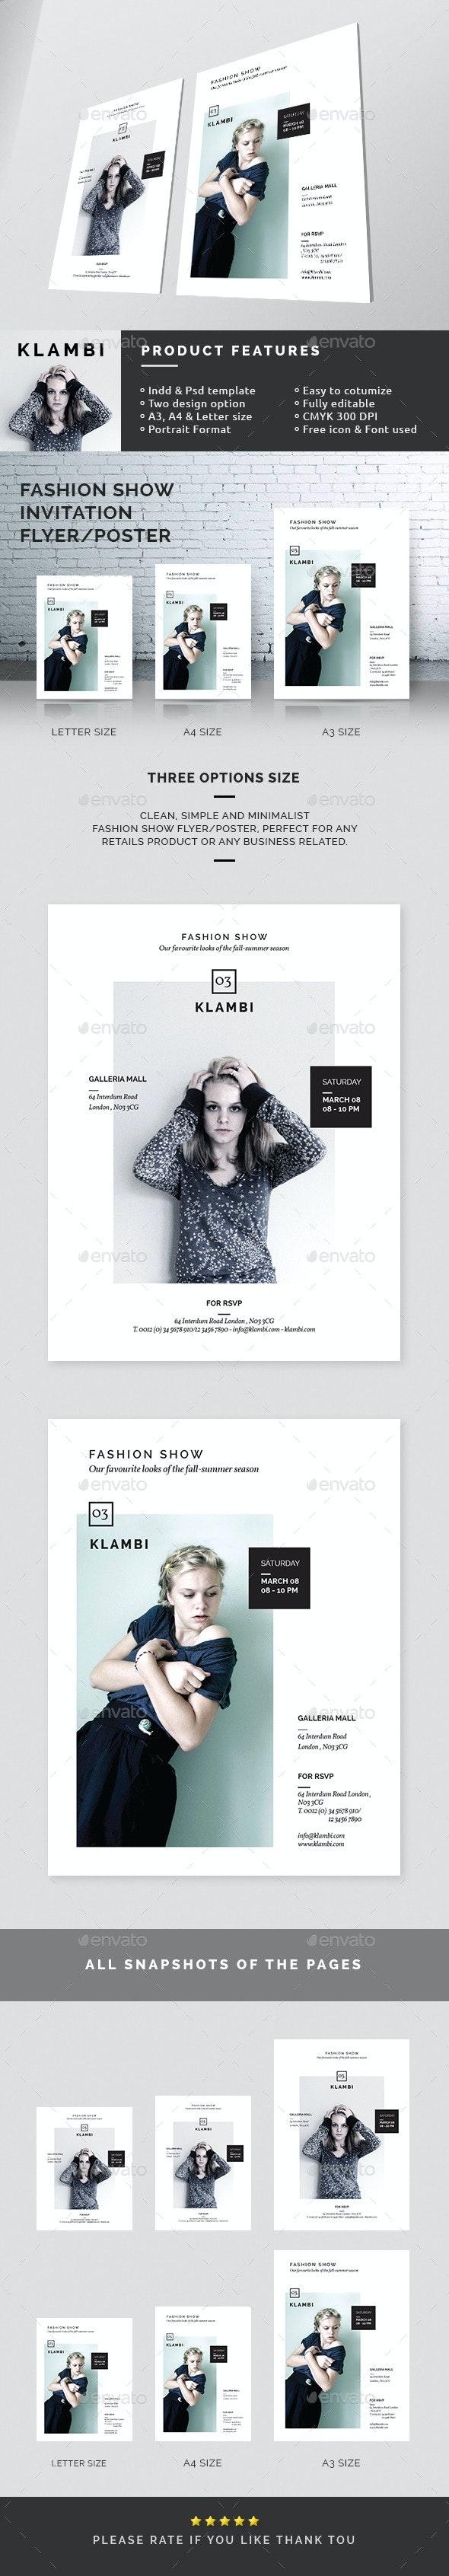 Fashion Show Invitation Flyer/Poster - Miscellaneous Events